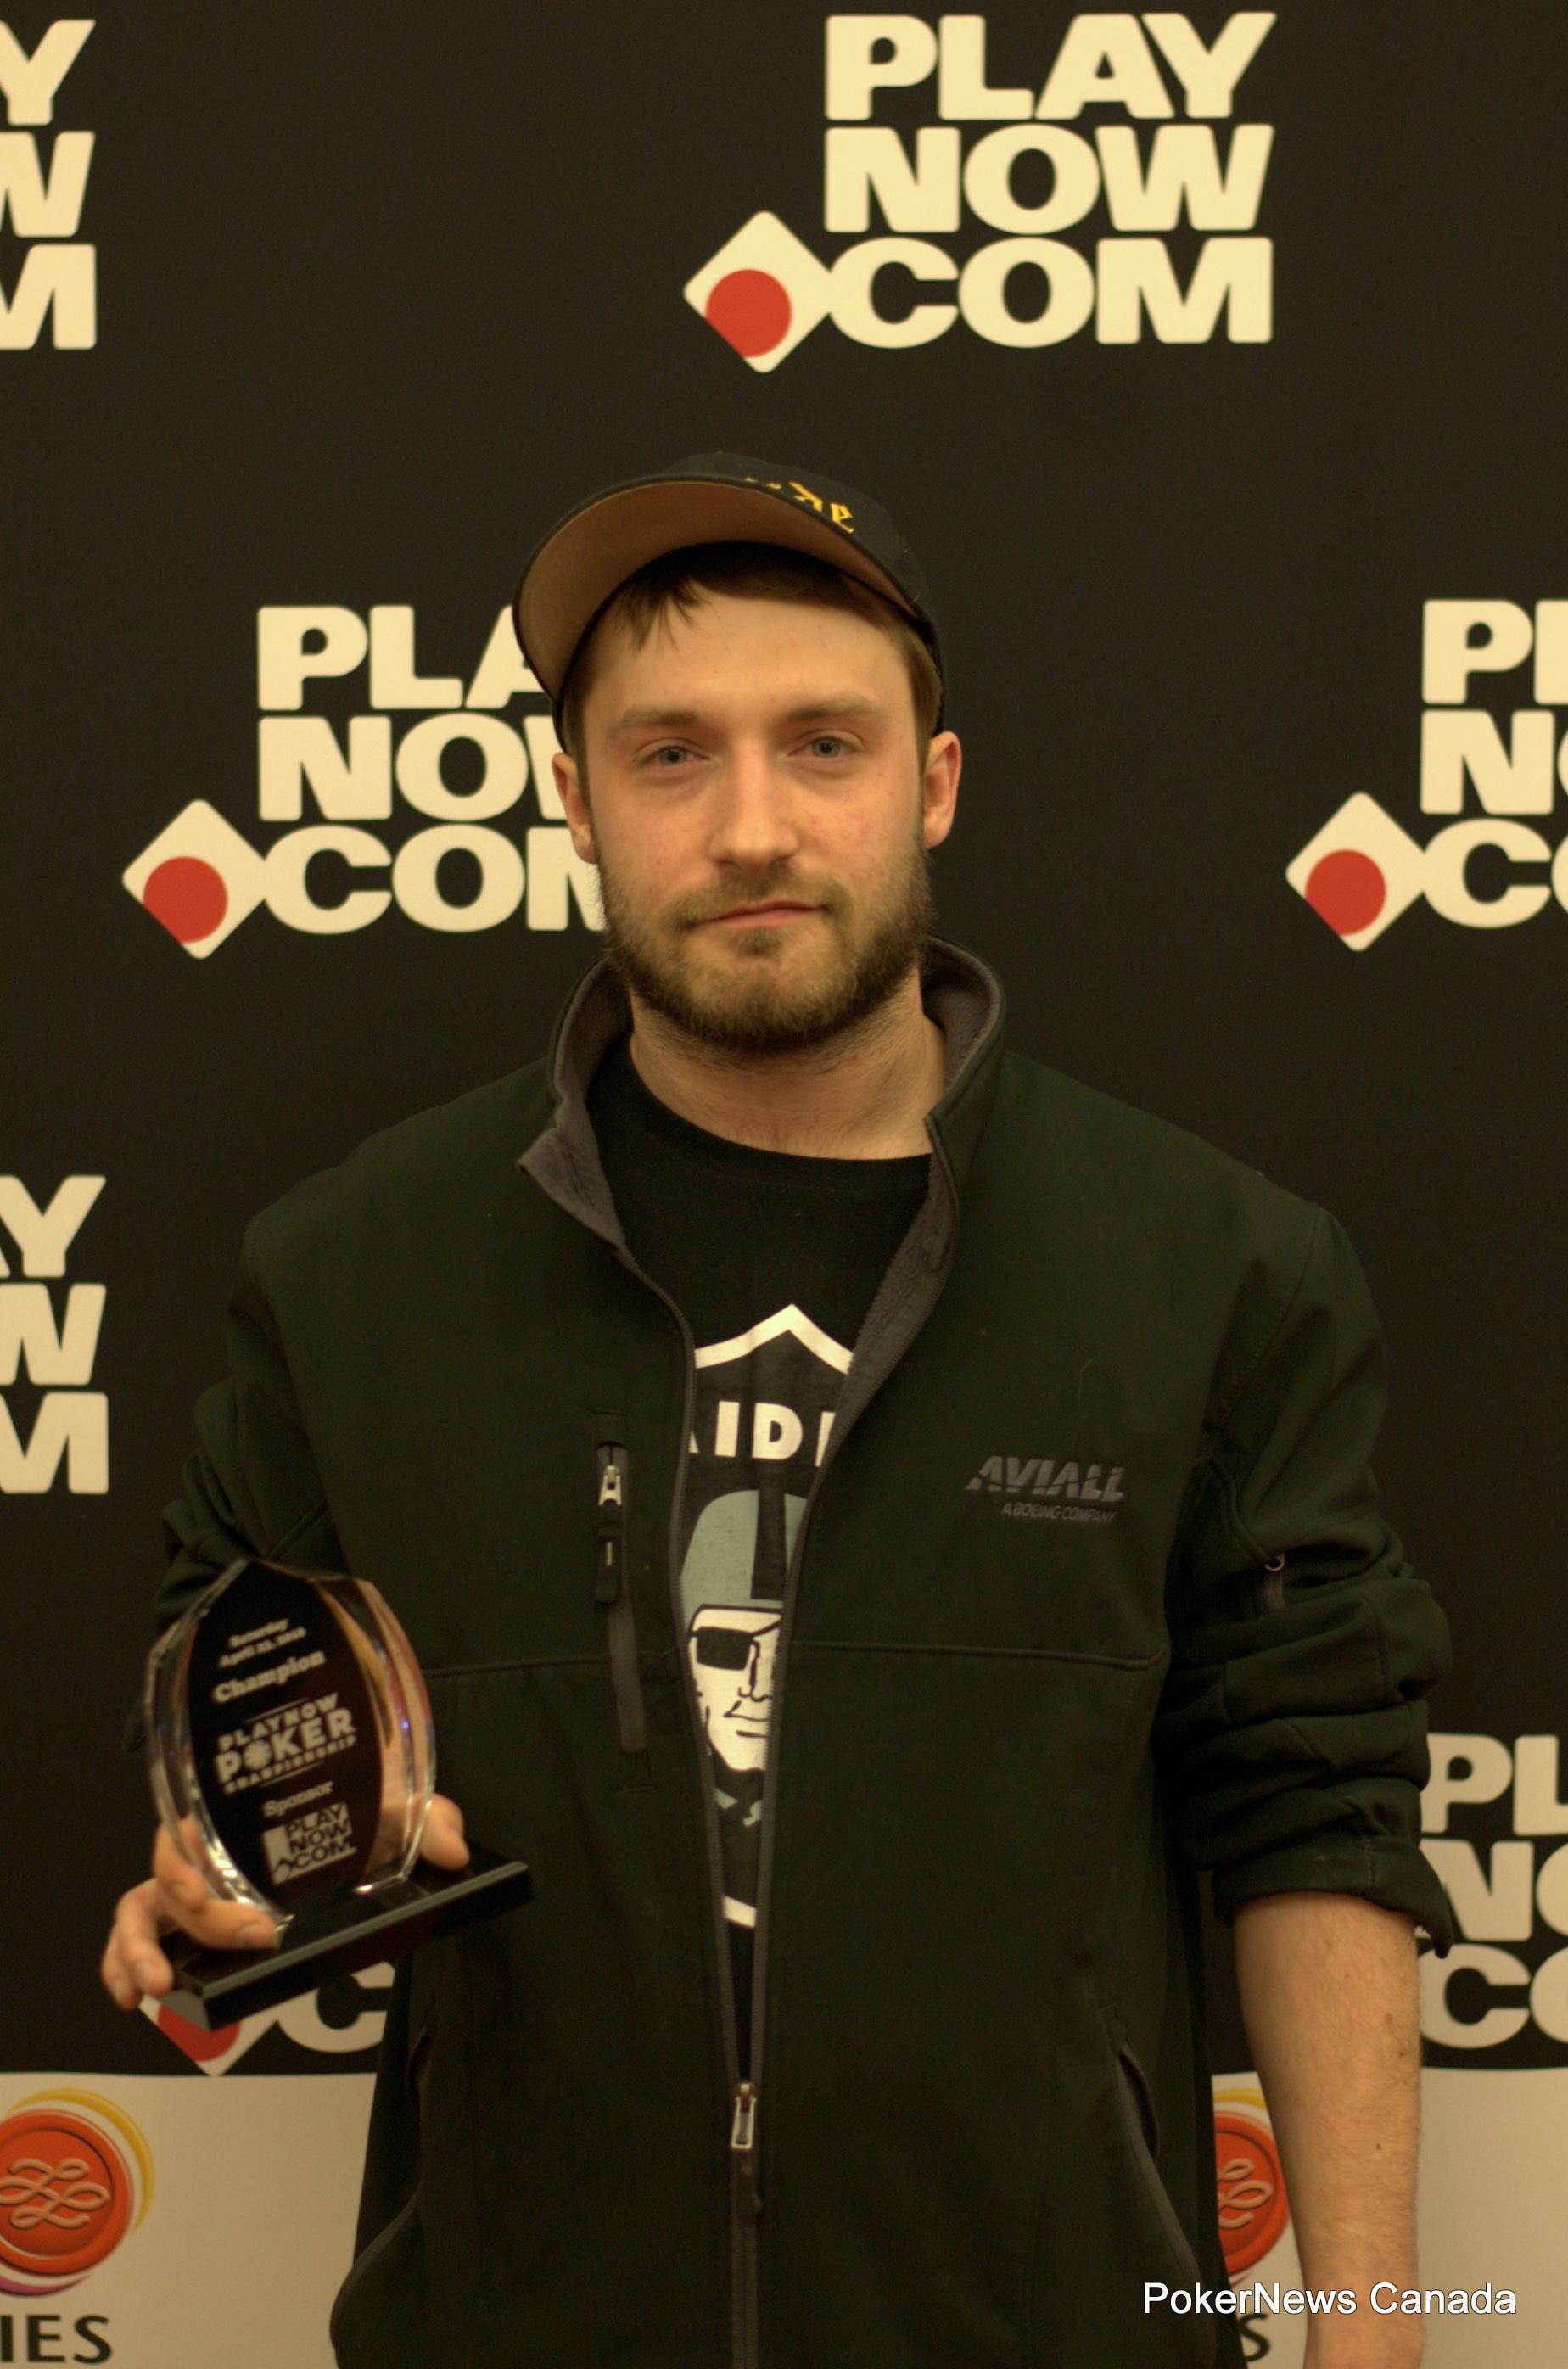 Jorday Feasey won the $400 PlayNow.com No Limit Hold'em Tournament.